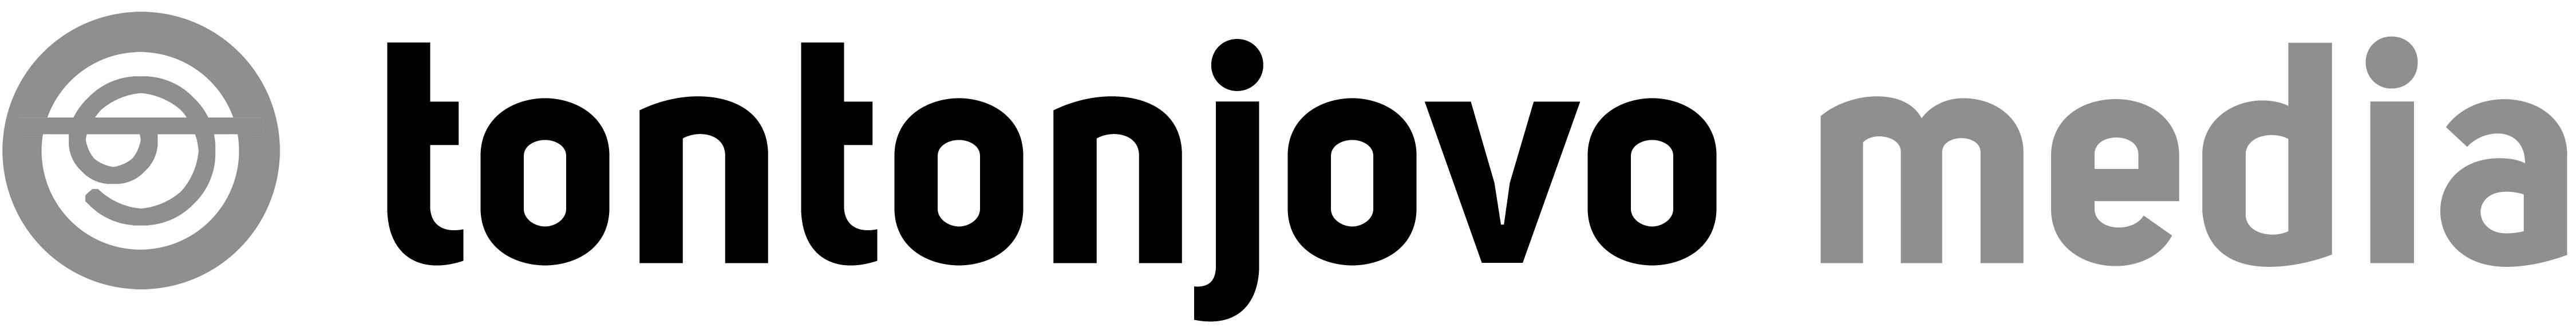 TontonJovo Media